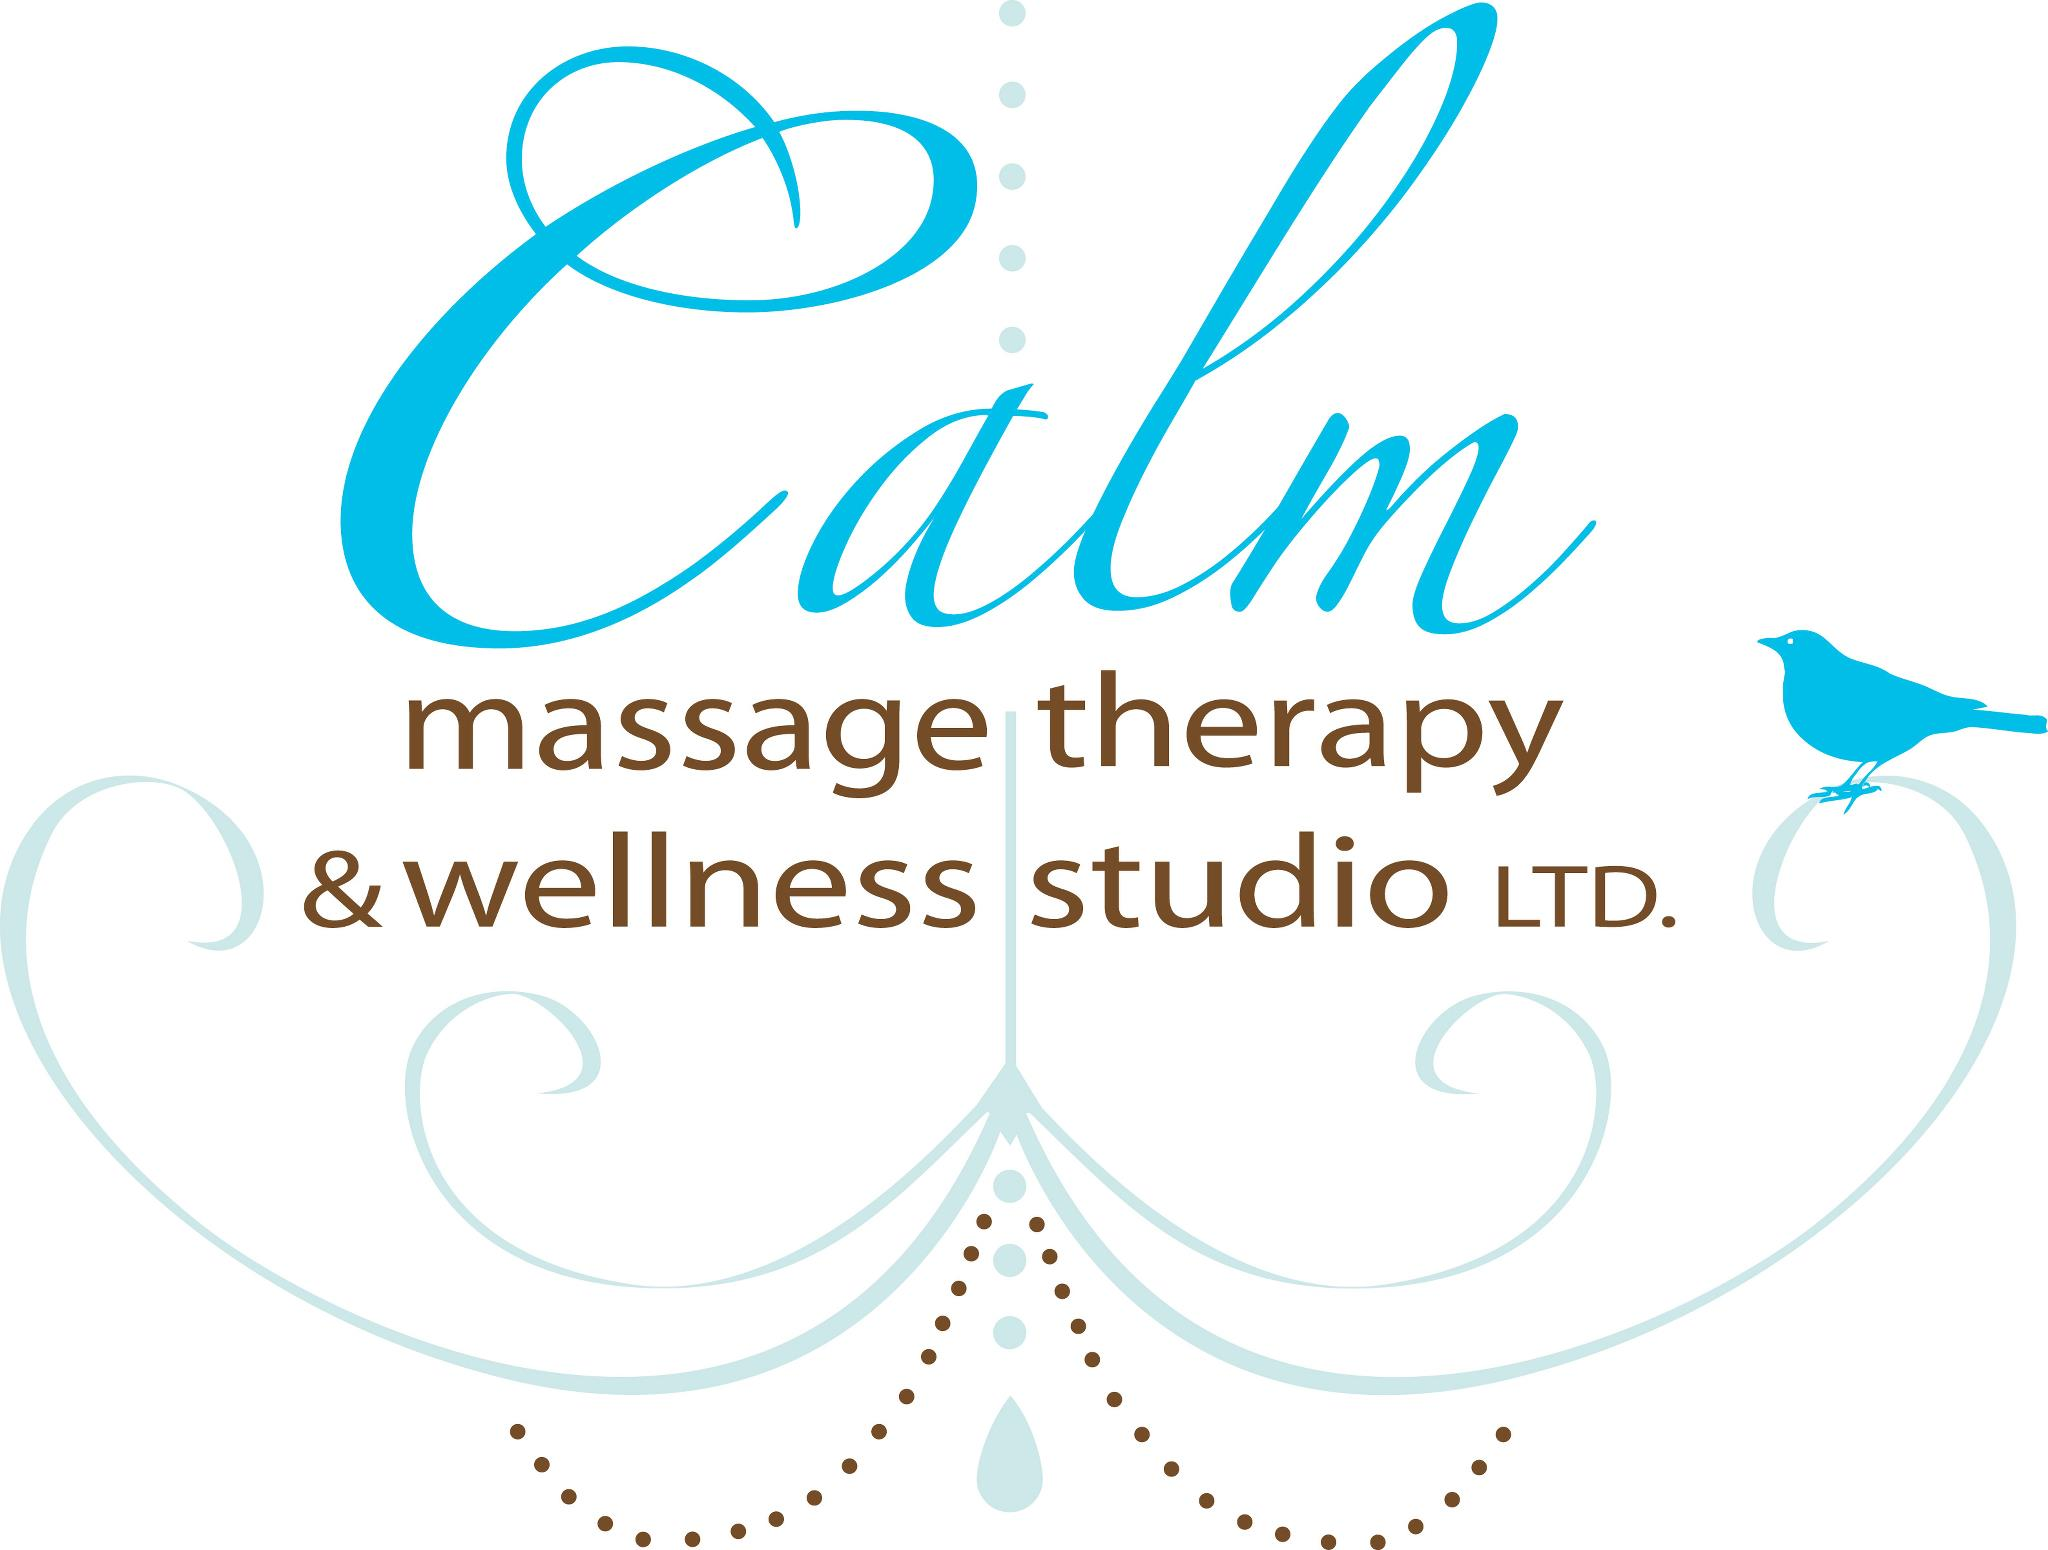 Calm Massage Therapy & Wellness Studio Ltd.